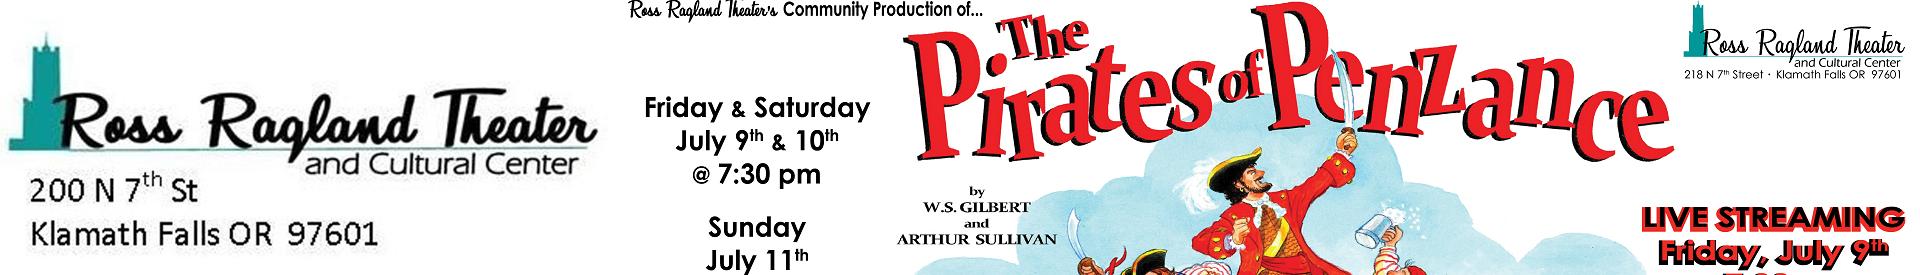 "Ross Ragland Theater presents ""The Pirates of Penzance"""